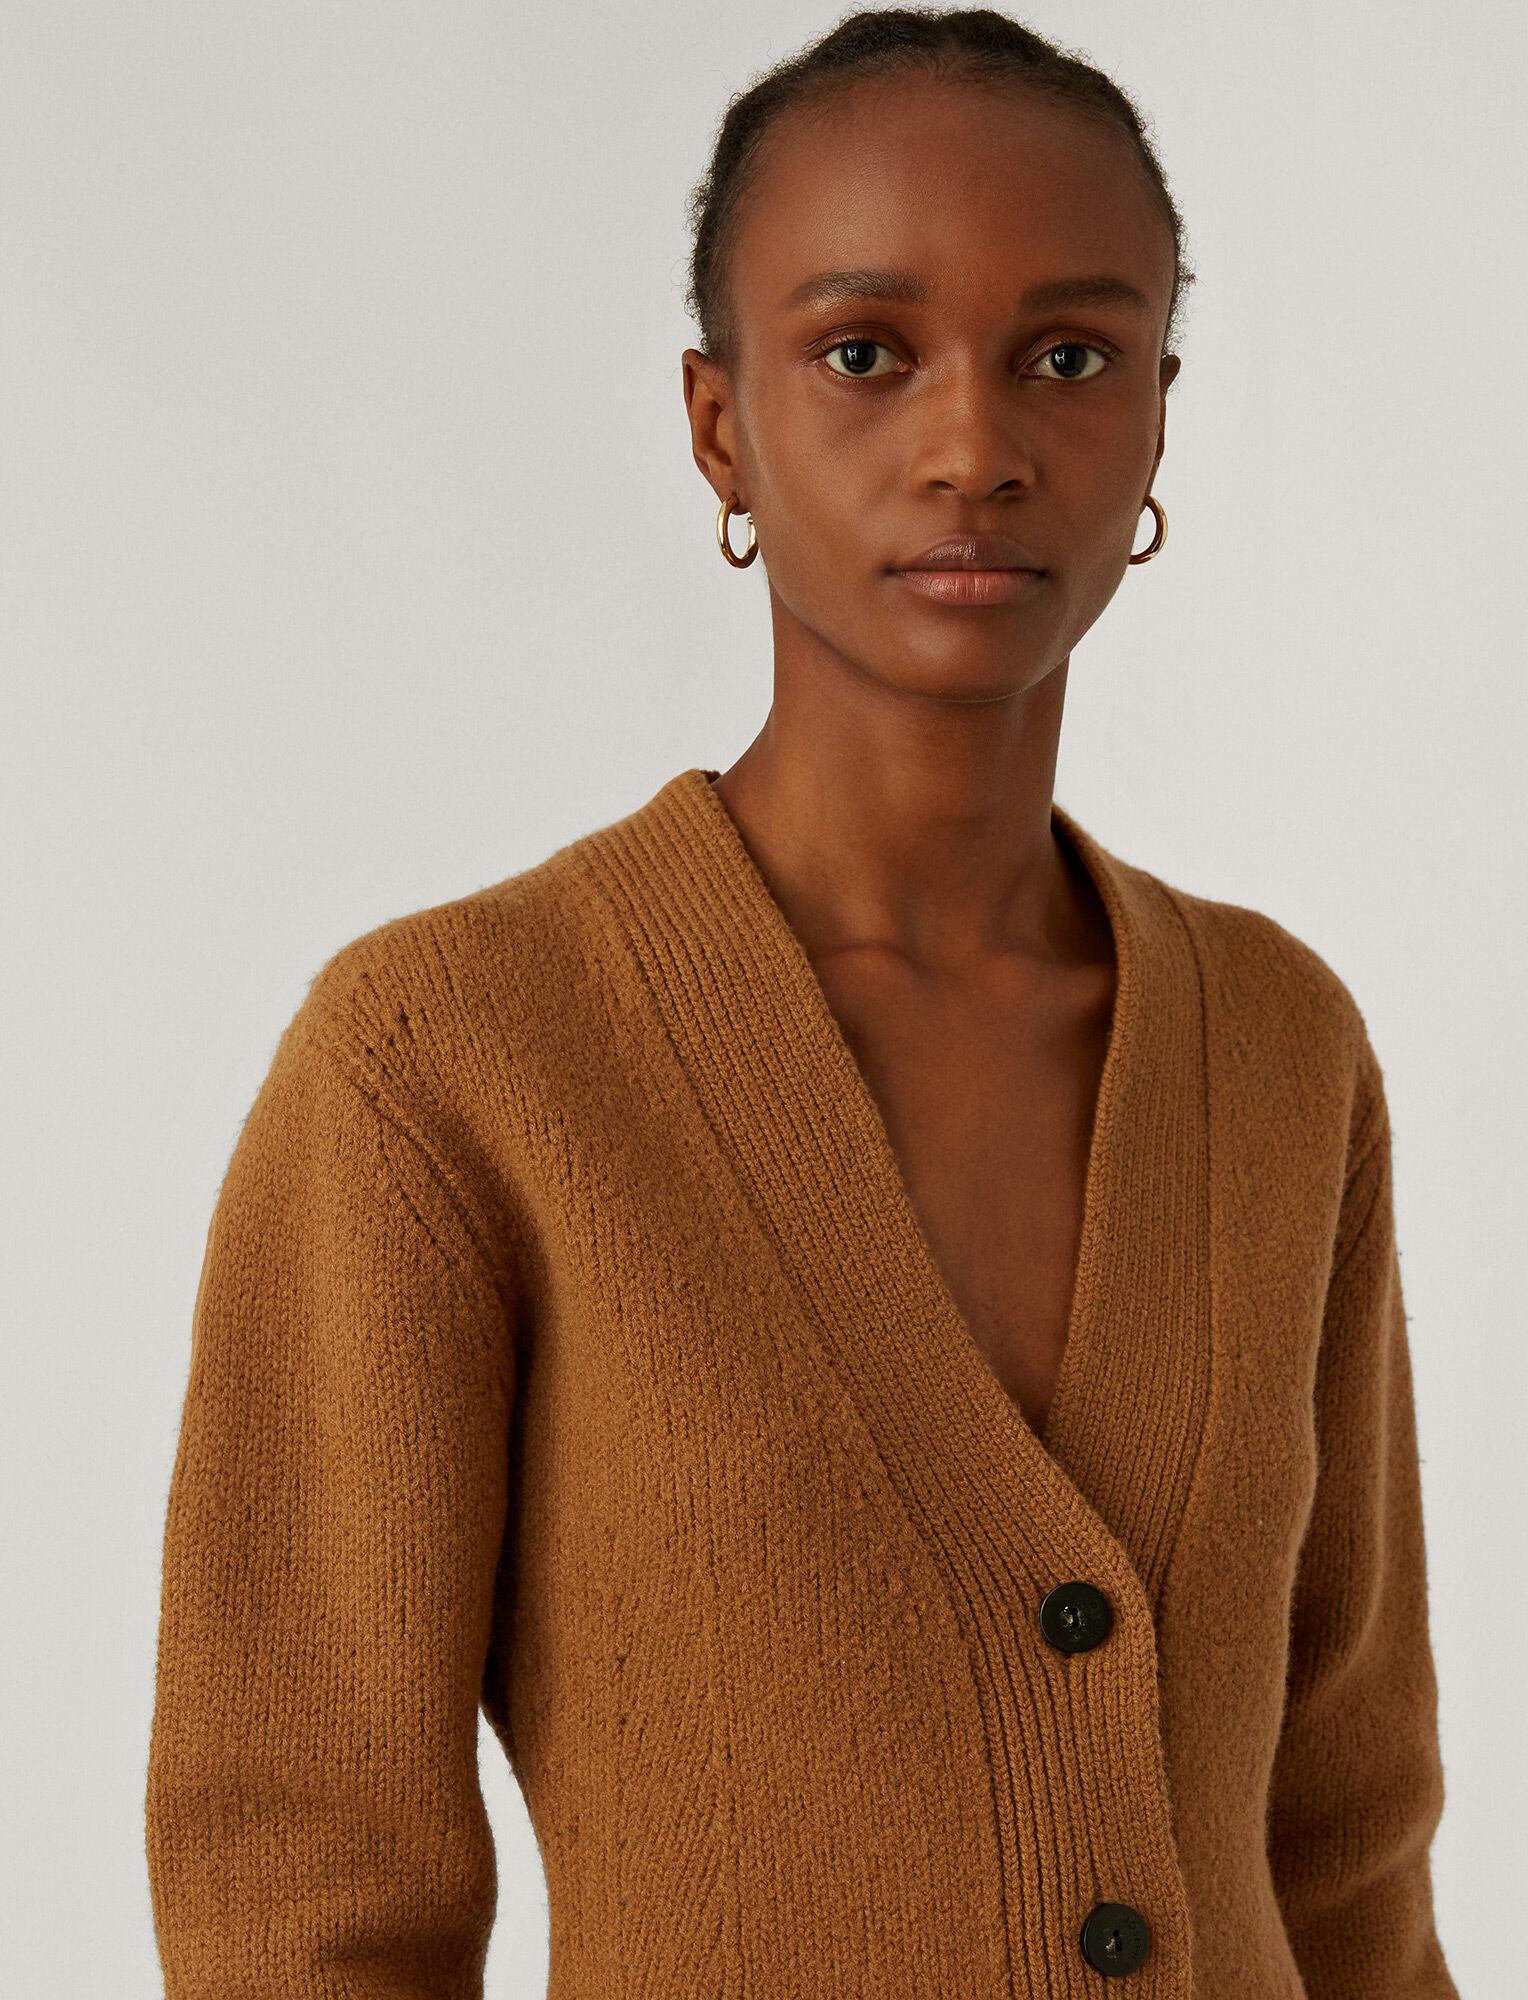 Joseph, Cardigan Boiled Wool Knit, in Camel